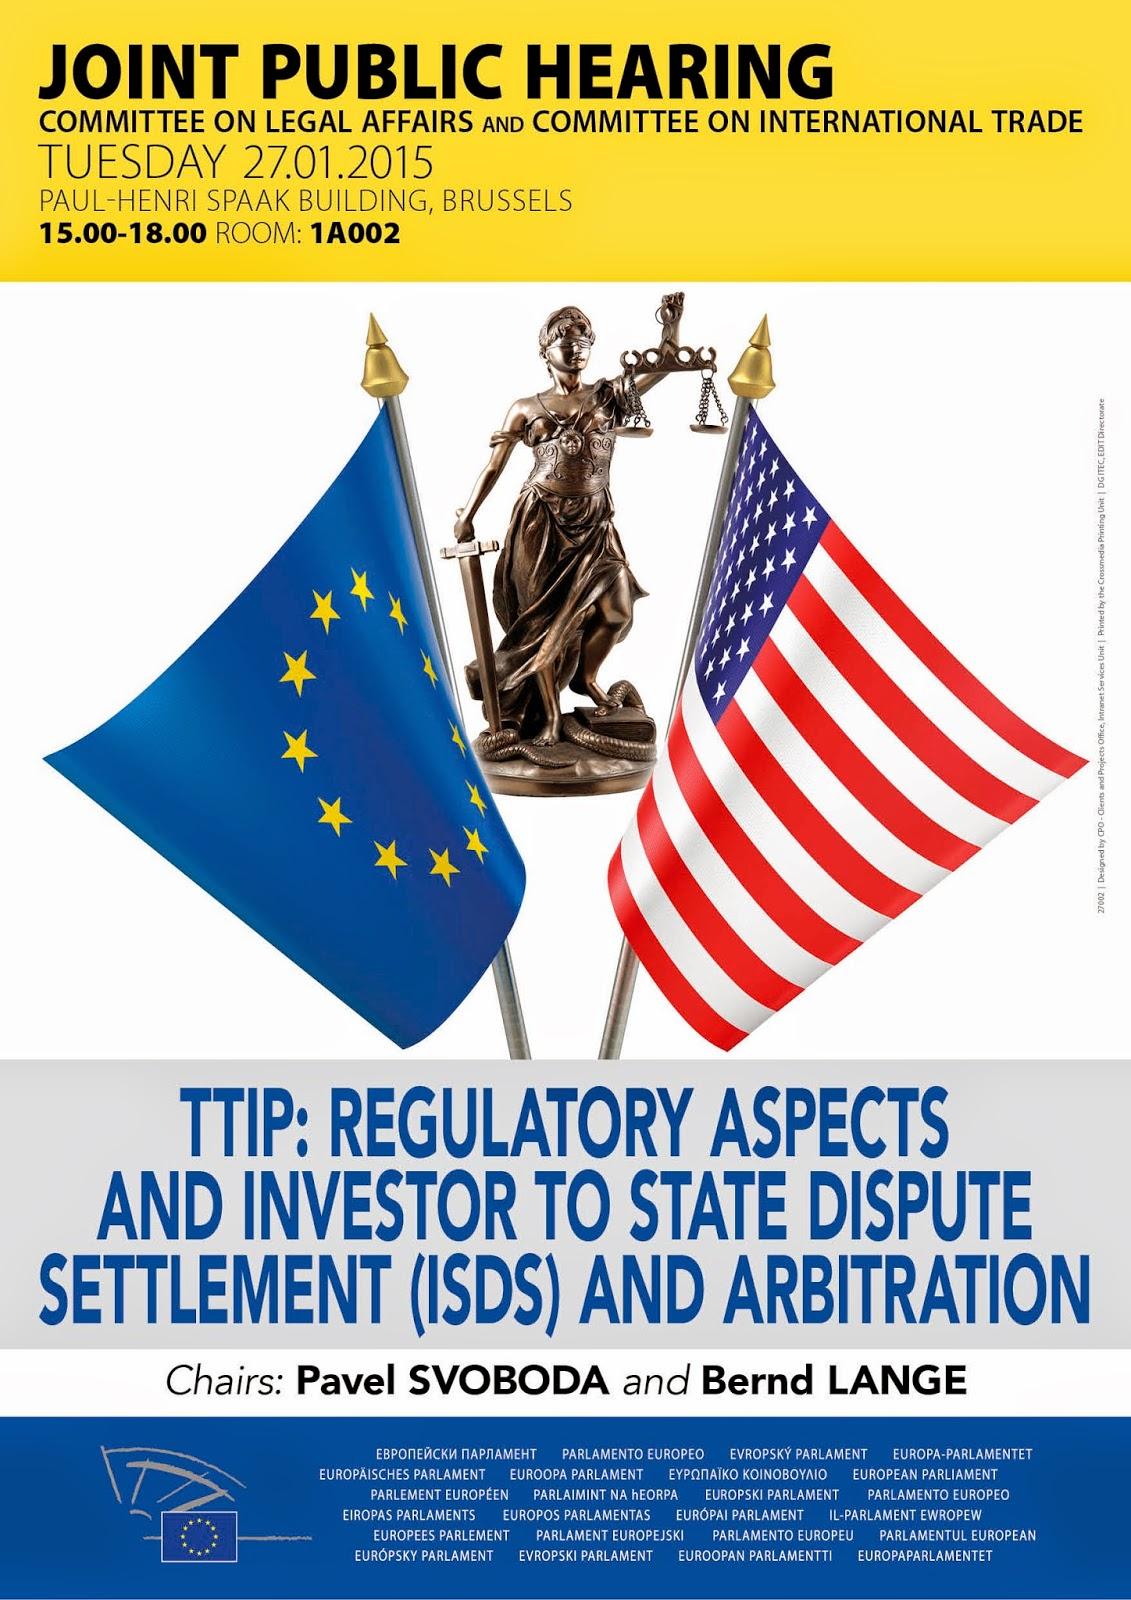 TRANSATLANTIC TRADE AND INVESTMENT PARTNERSHIP (TTIP): REGULATORY ASPECTS